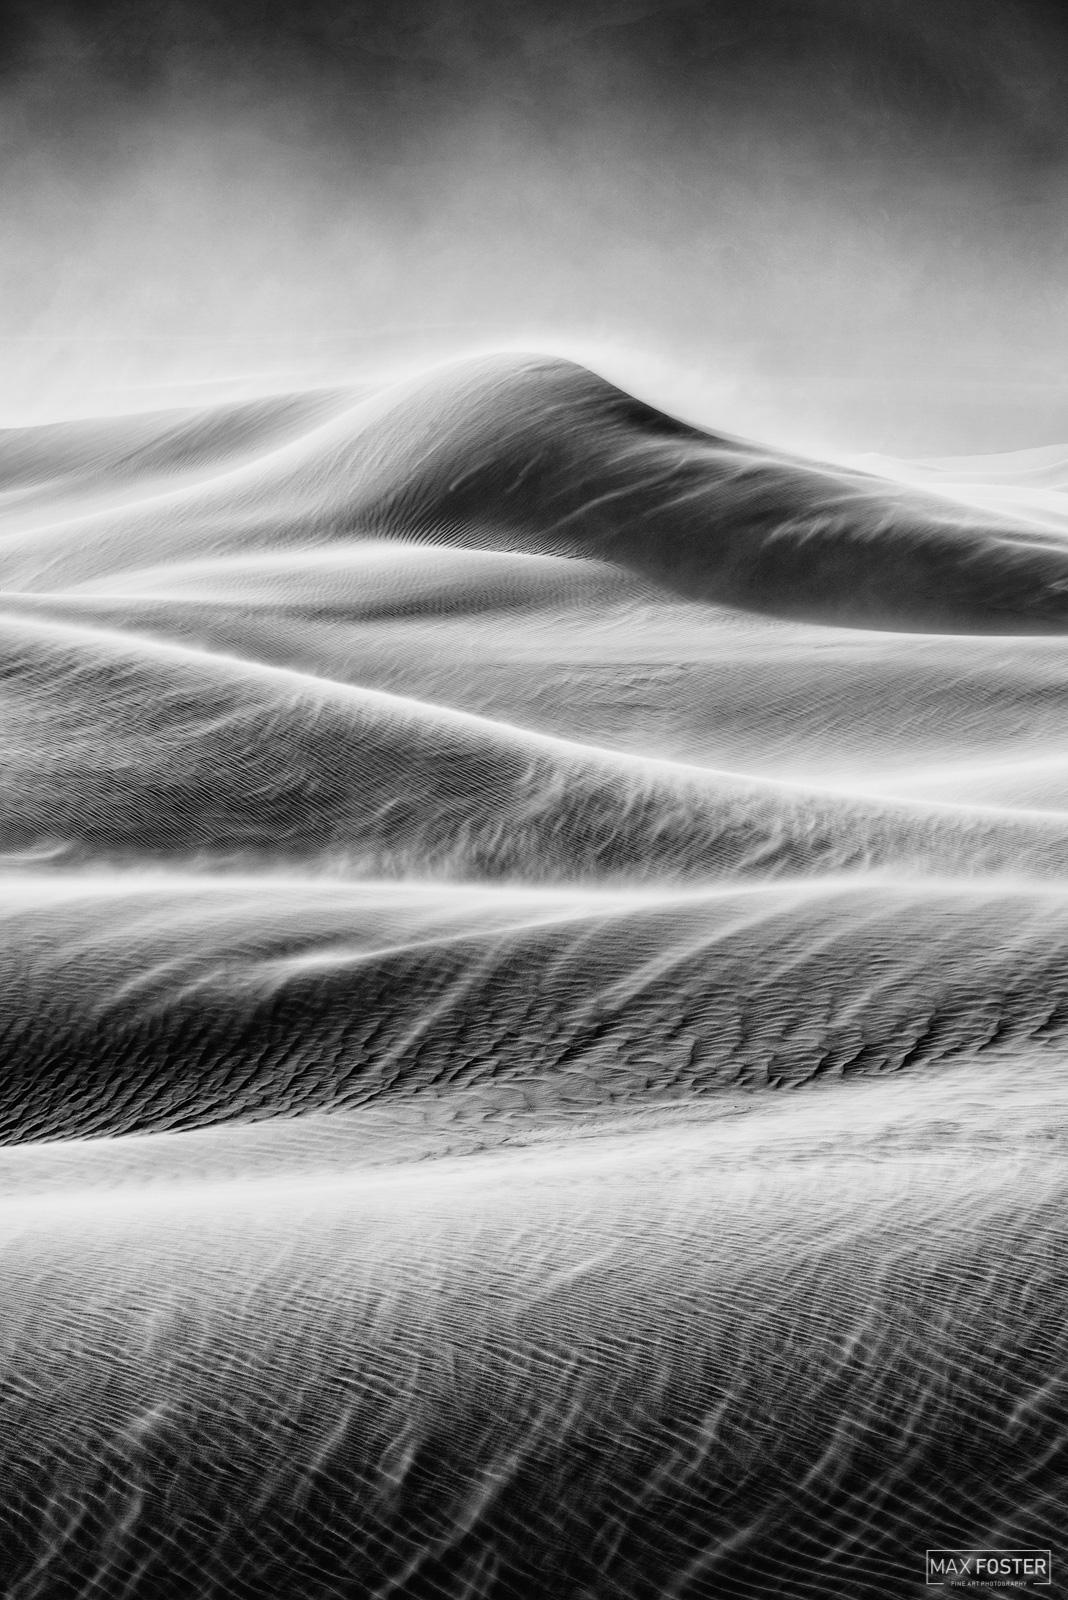 Mesquite Flat Sand Dunes, Death Valley National Park, California, Fury, photo